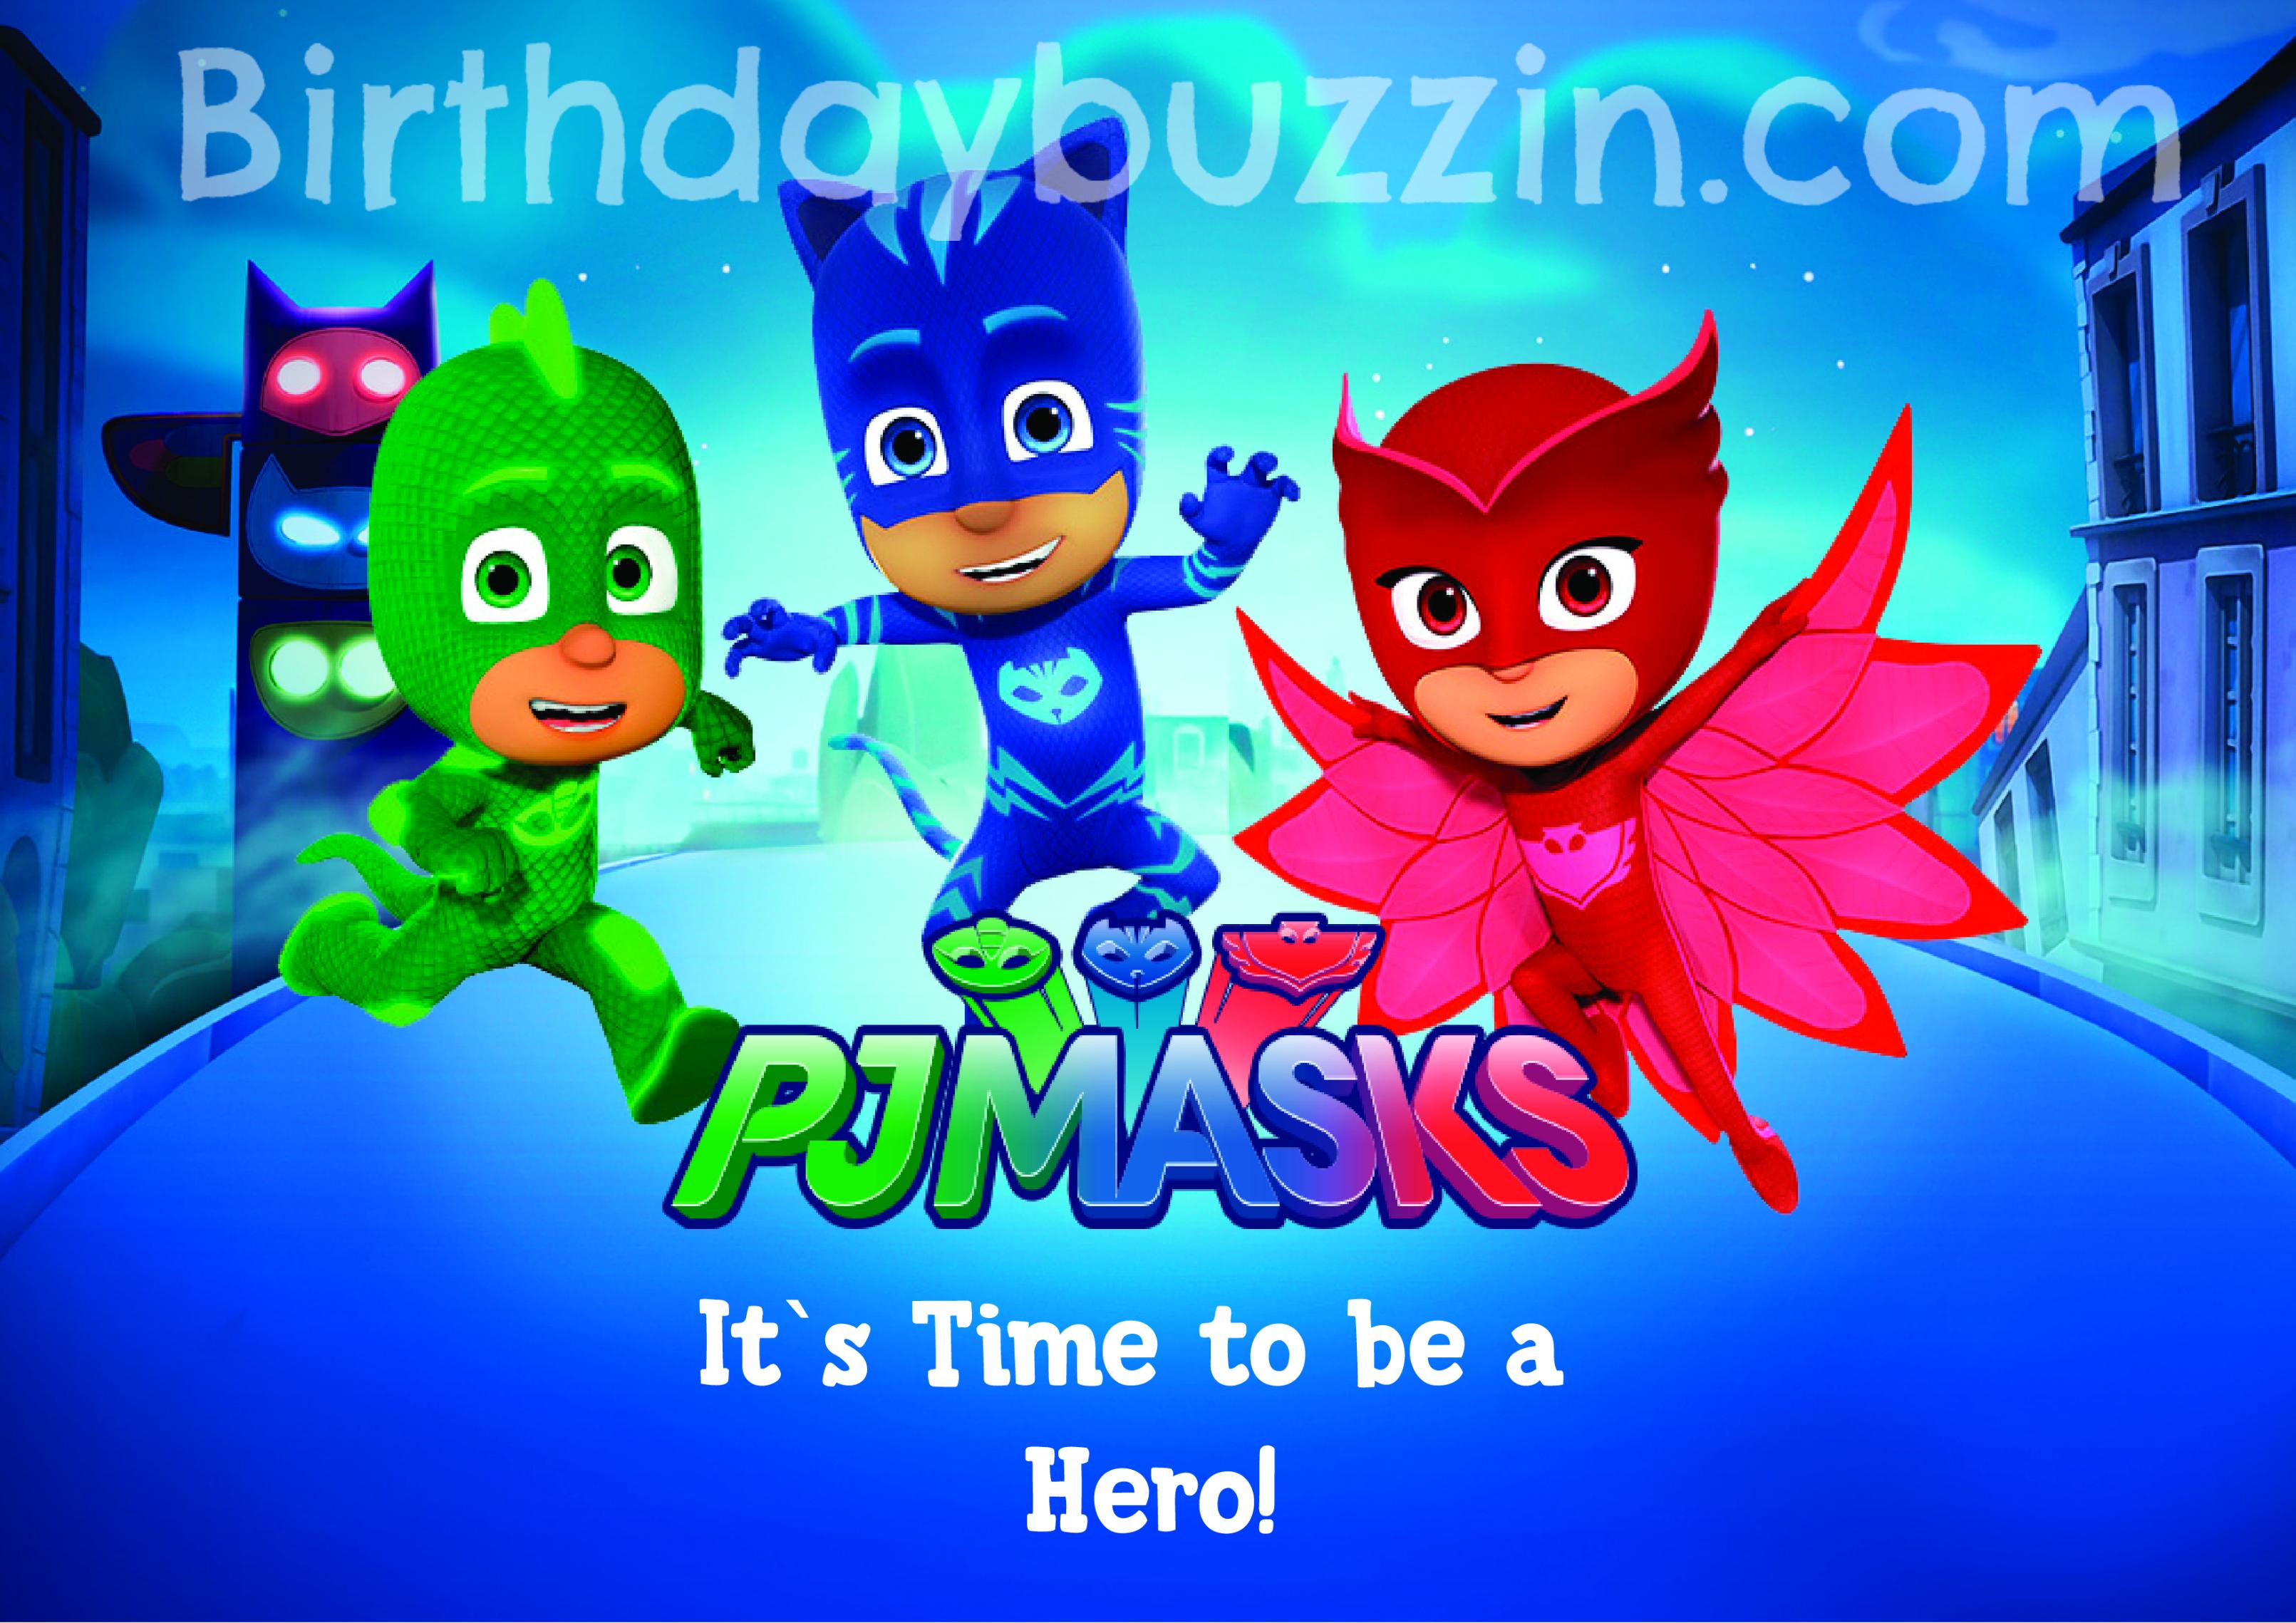 Free Printable Pj Masks Placemats | Birthday Buzzin - Pj Mask Free Printables